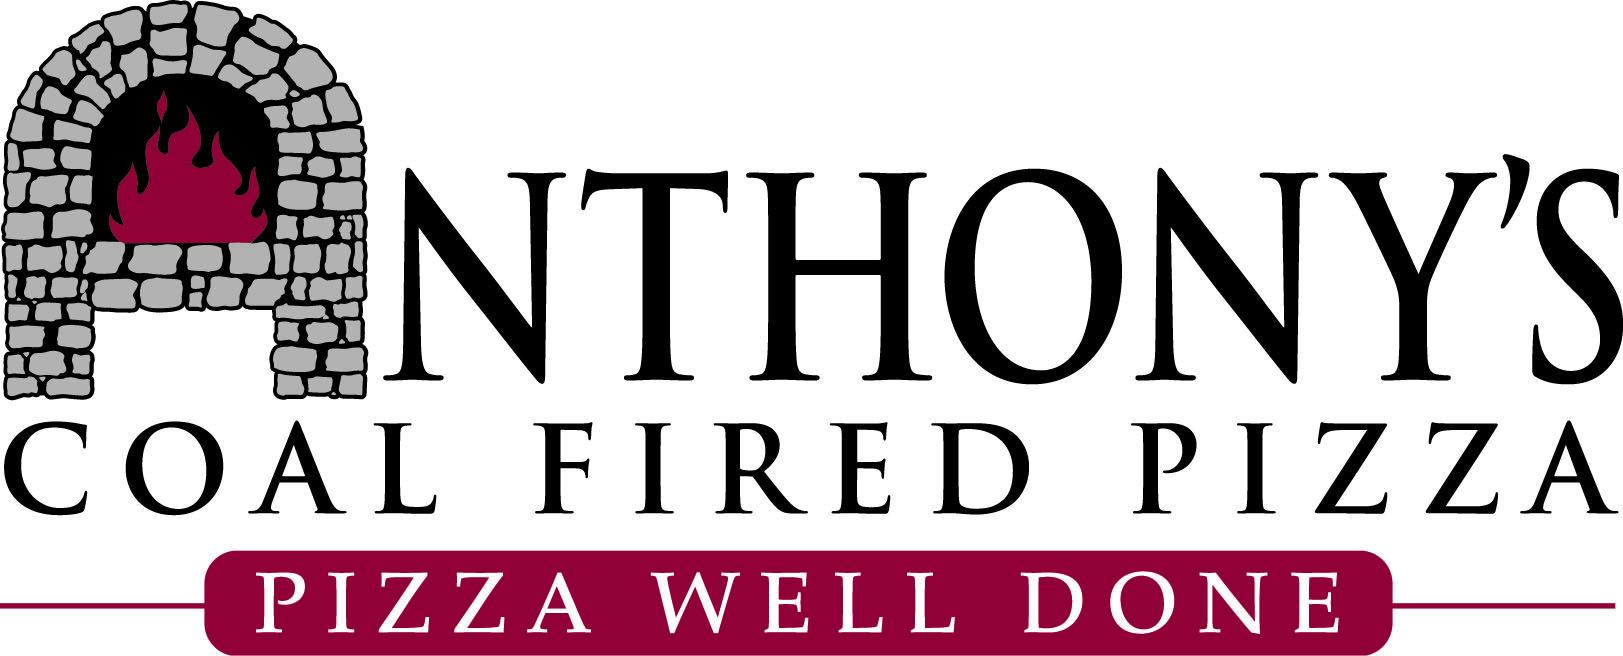 Anthonys-Coal-Fired-Pizza-Logo-2.jpg